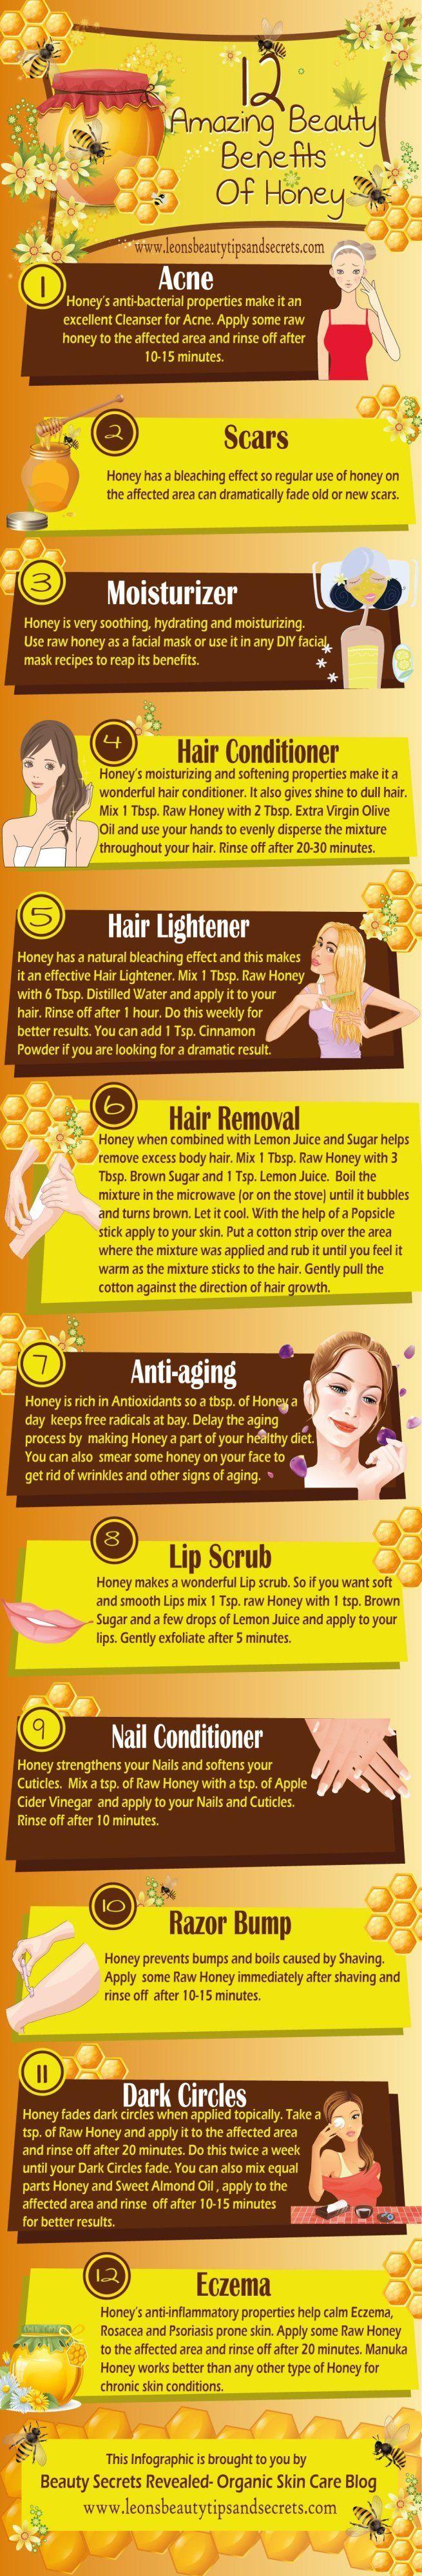 12-Amazing-Beauty-Benefits-of-Honey.jpg (655×4000)